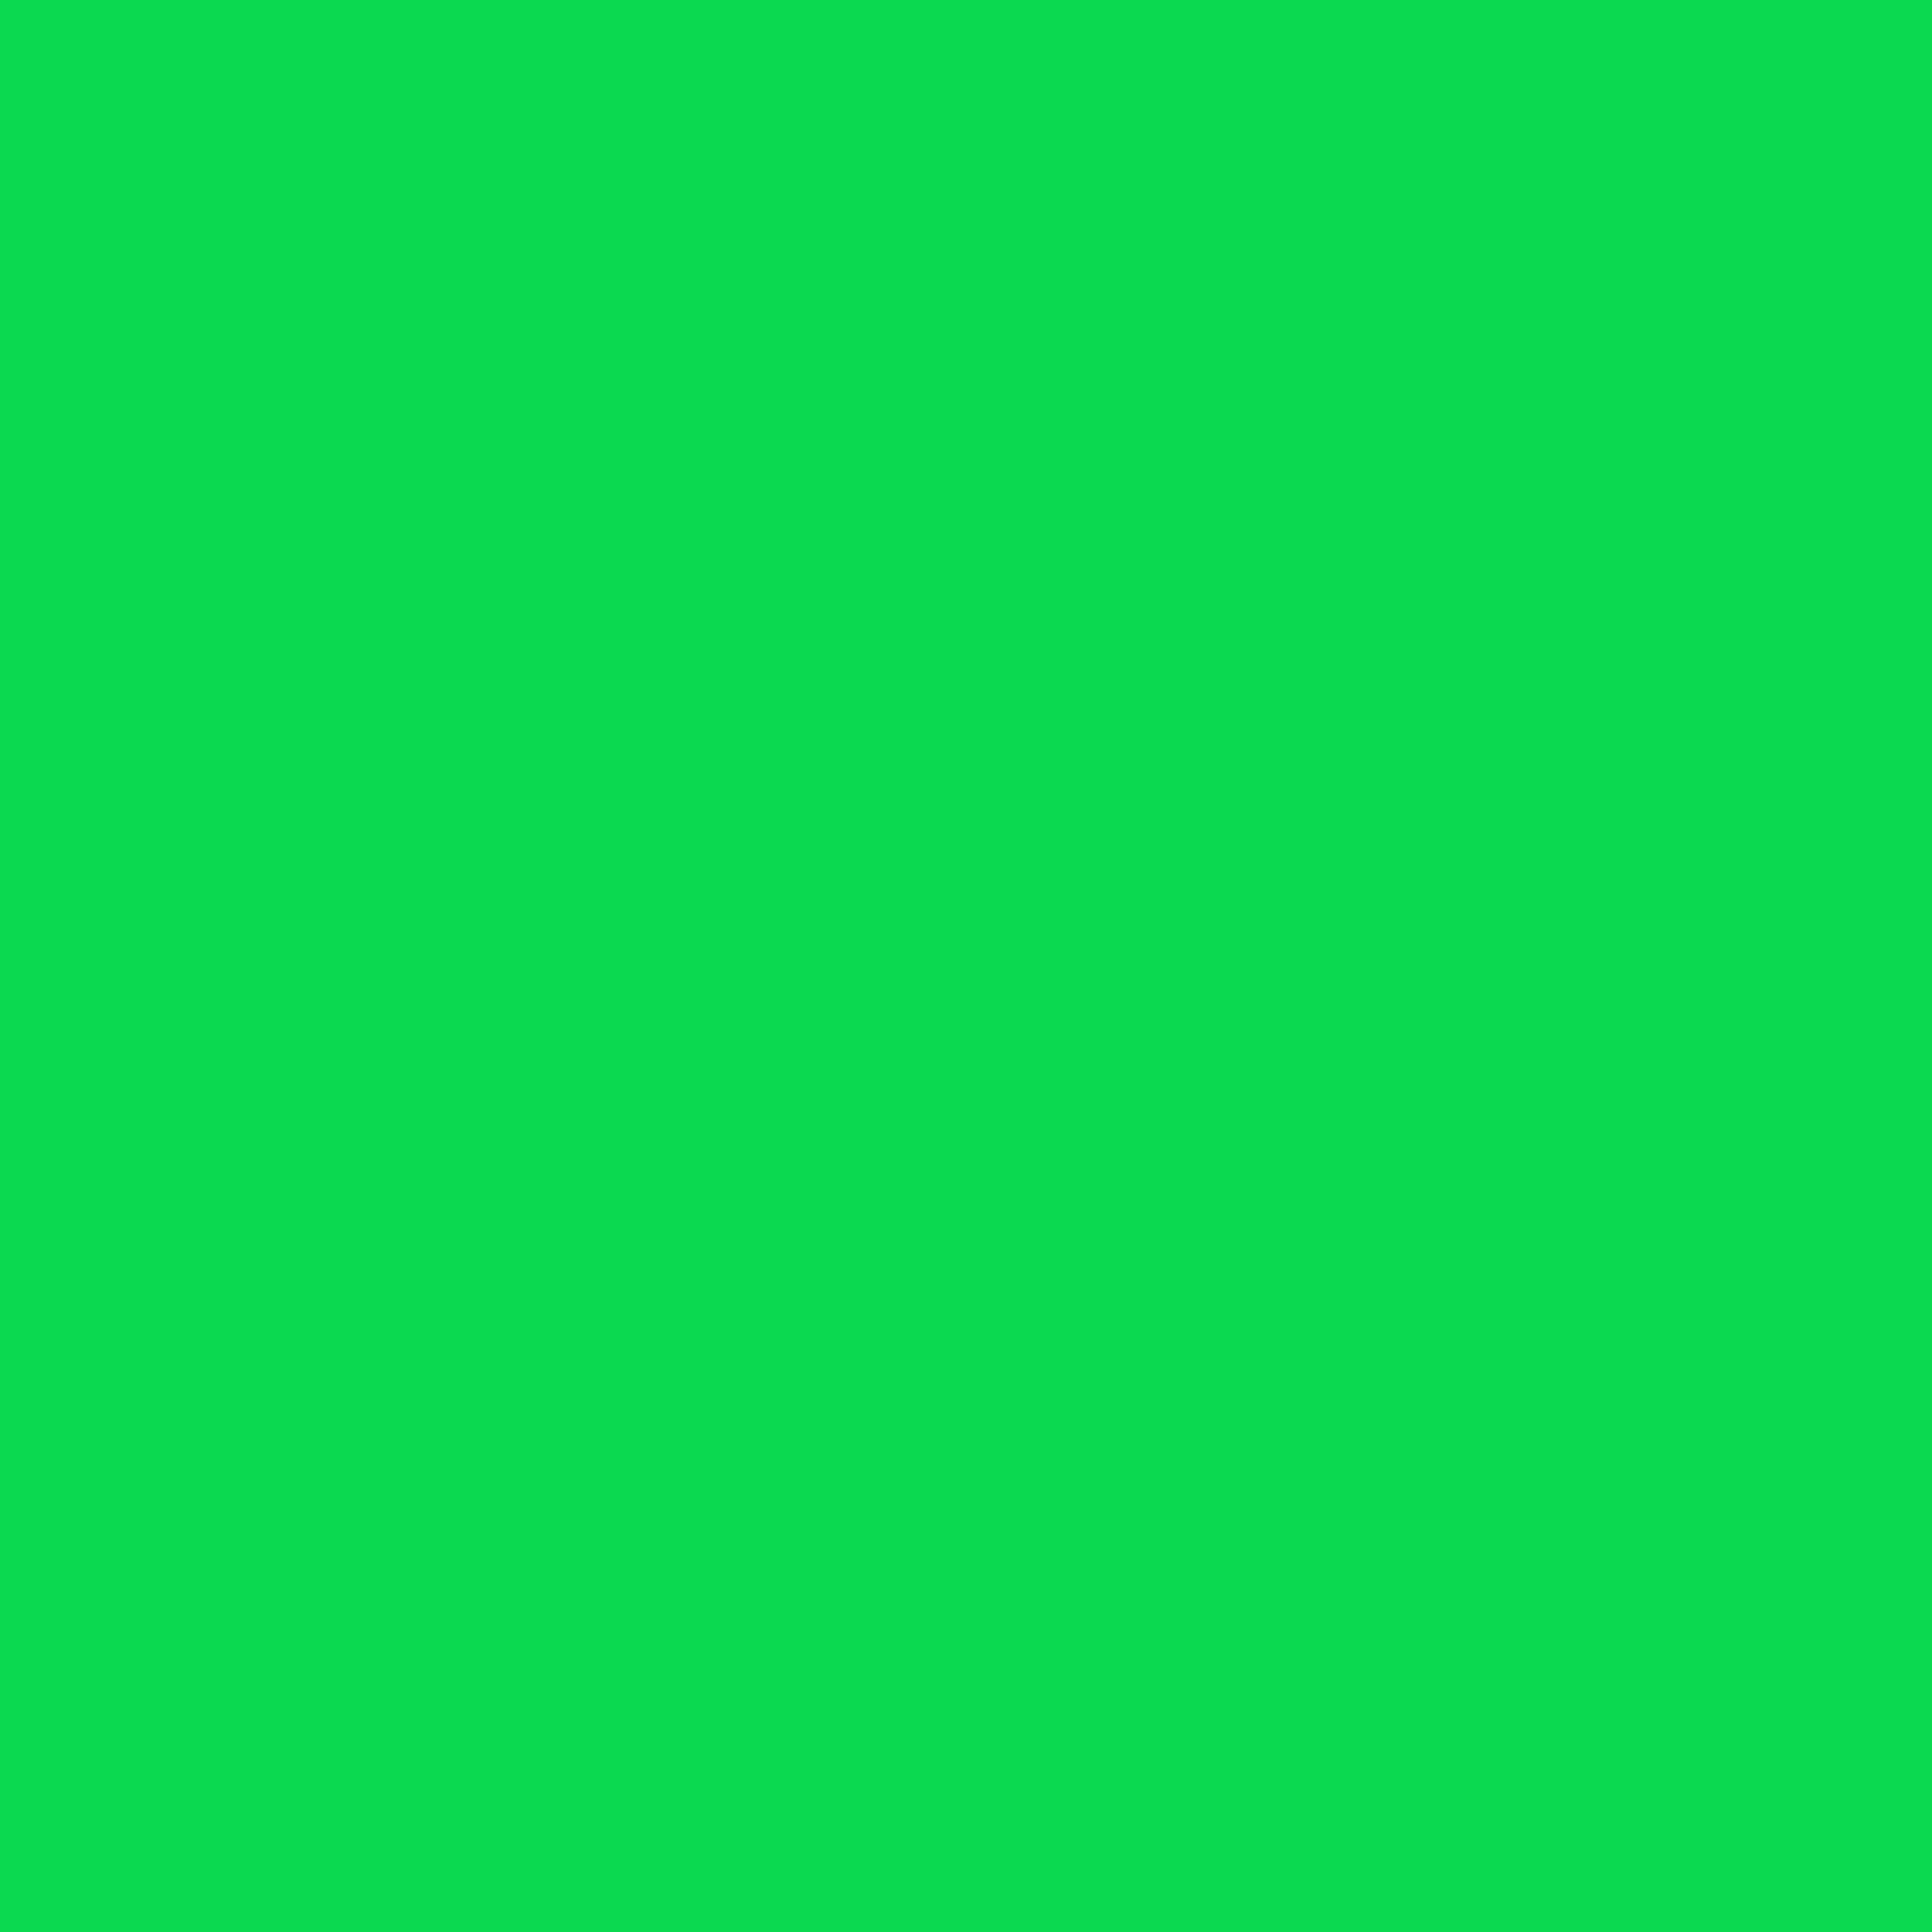 2732x2732 Malachite Solid Color Background